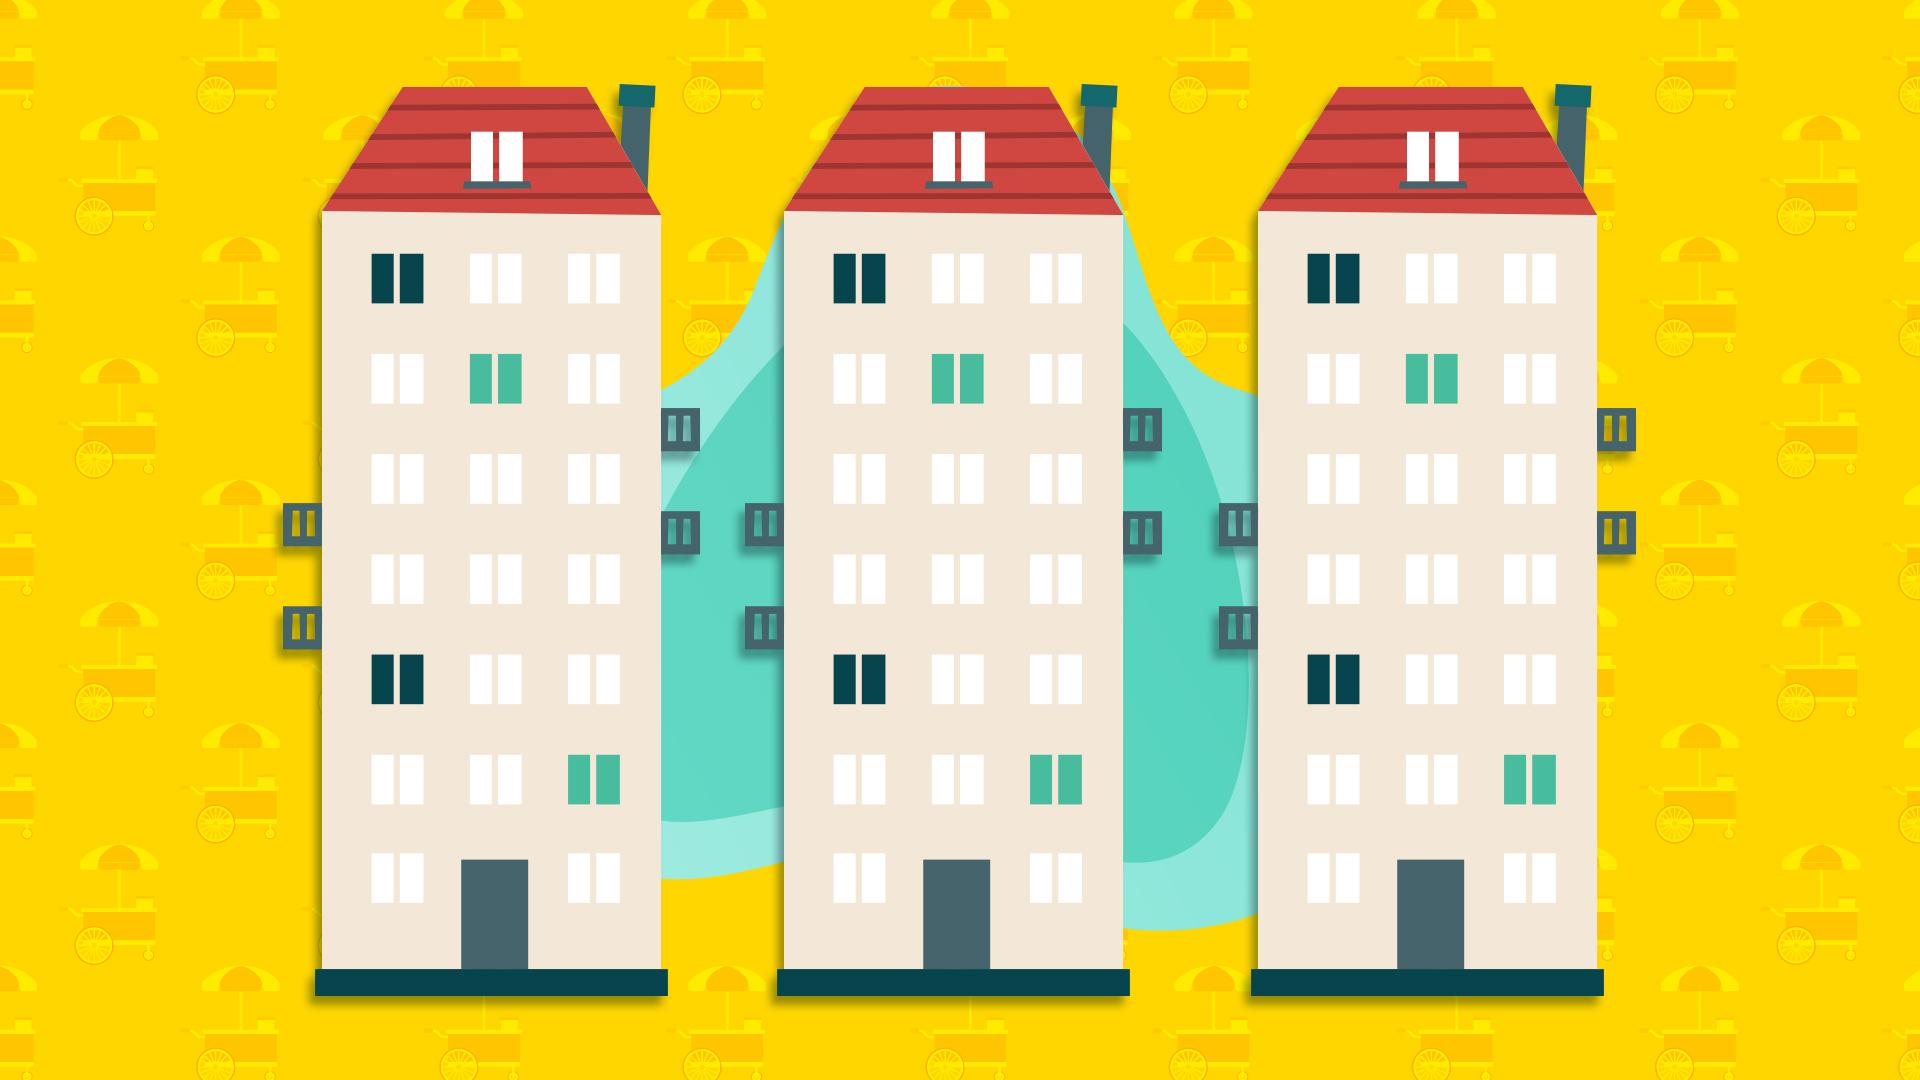 Apartment dwellers